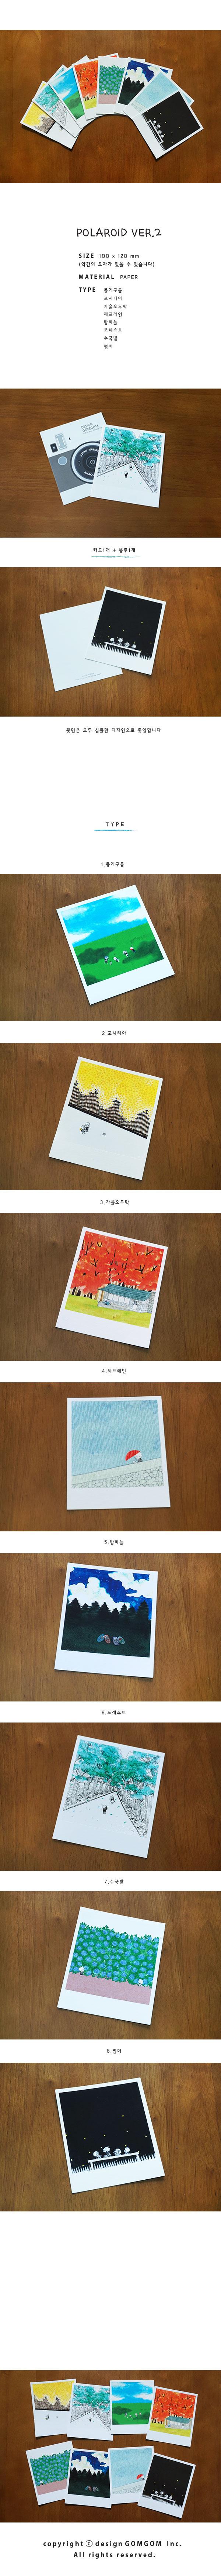 Polaroid card ver.2 - 디자인곰곰, 1,000원, 카드, 디자인 카드